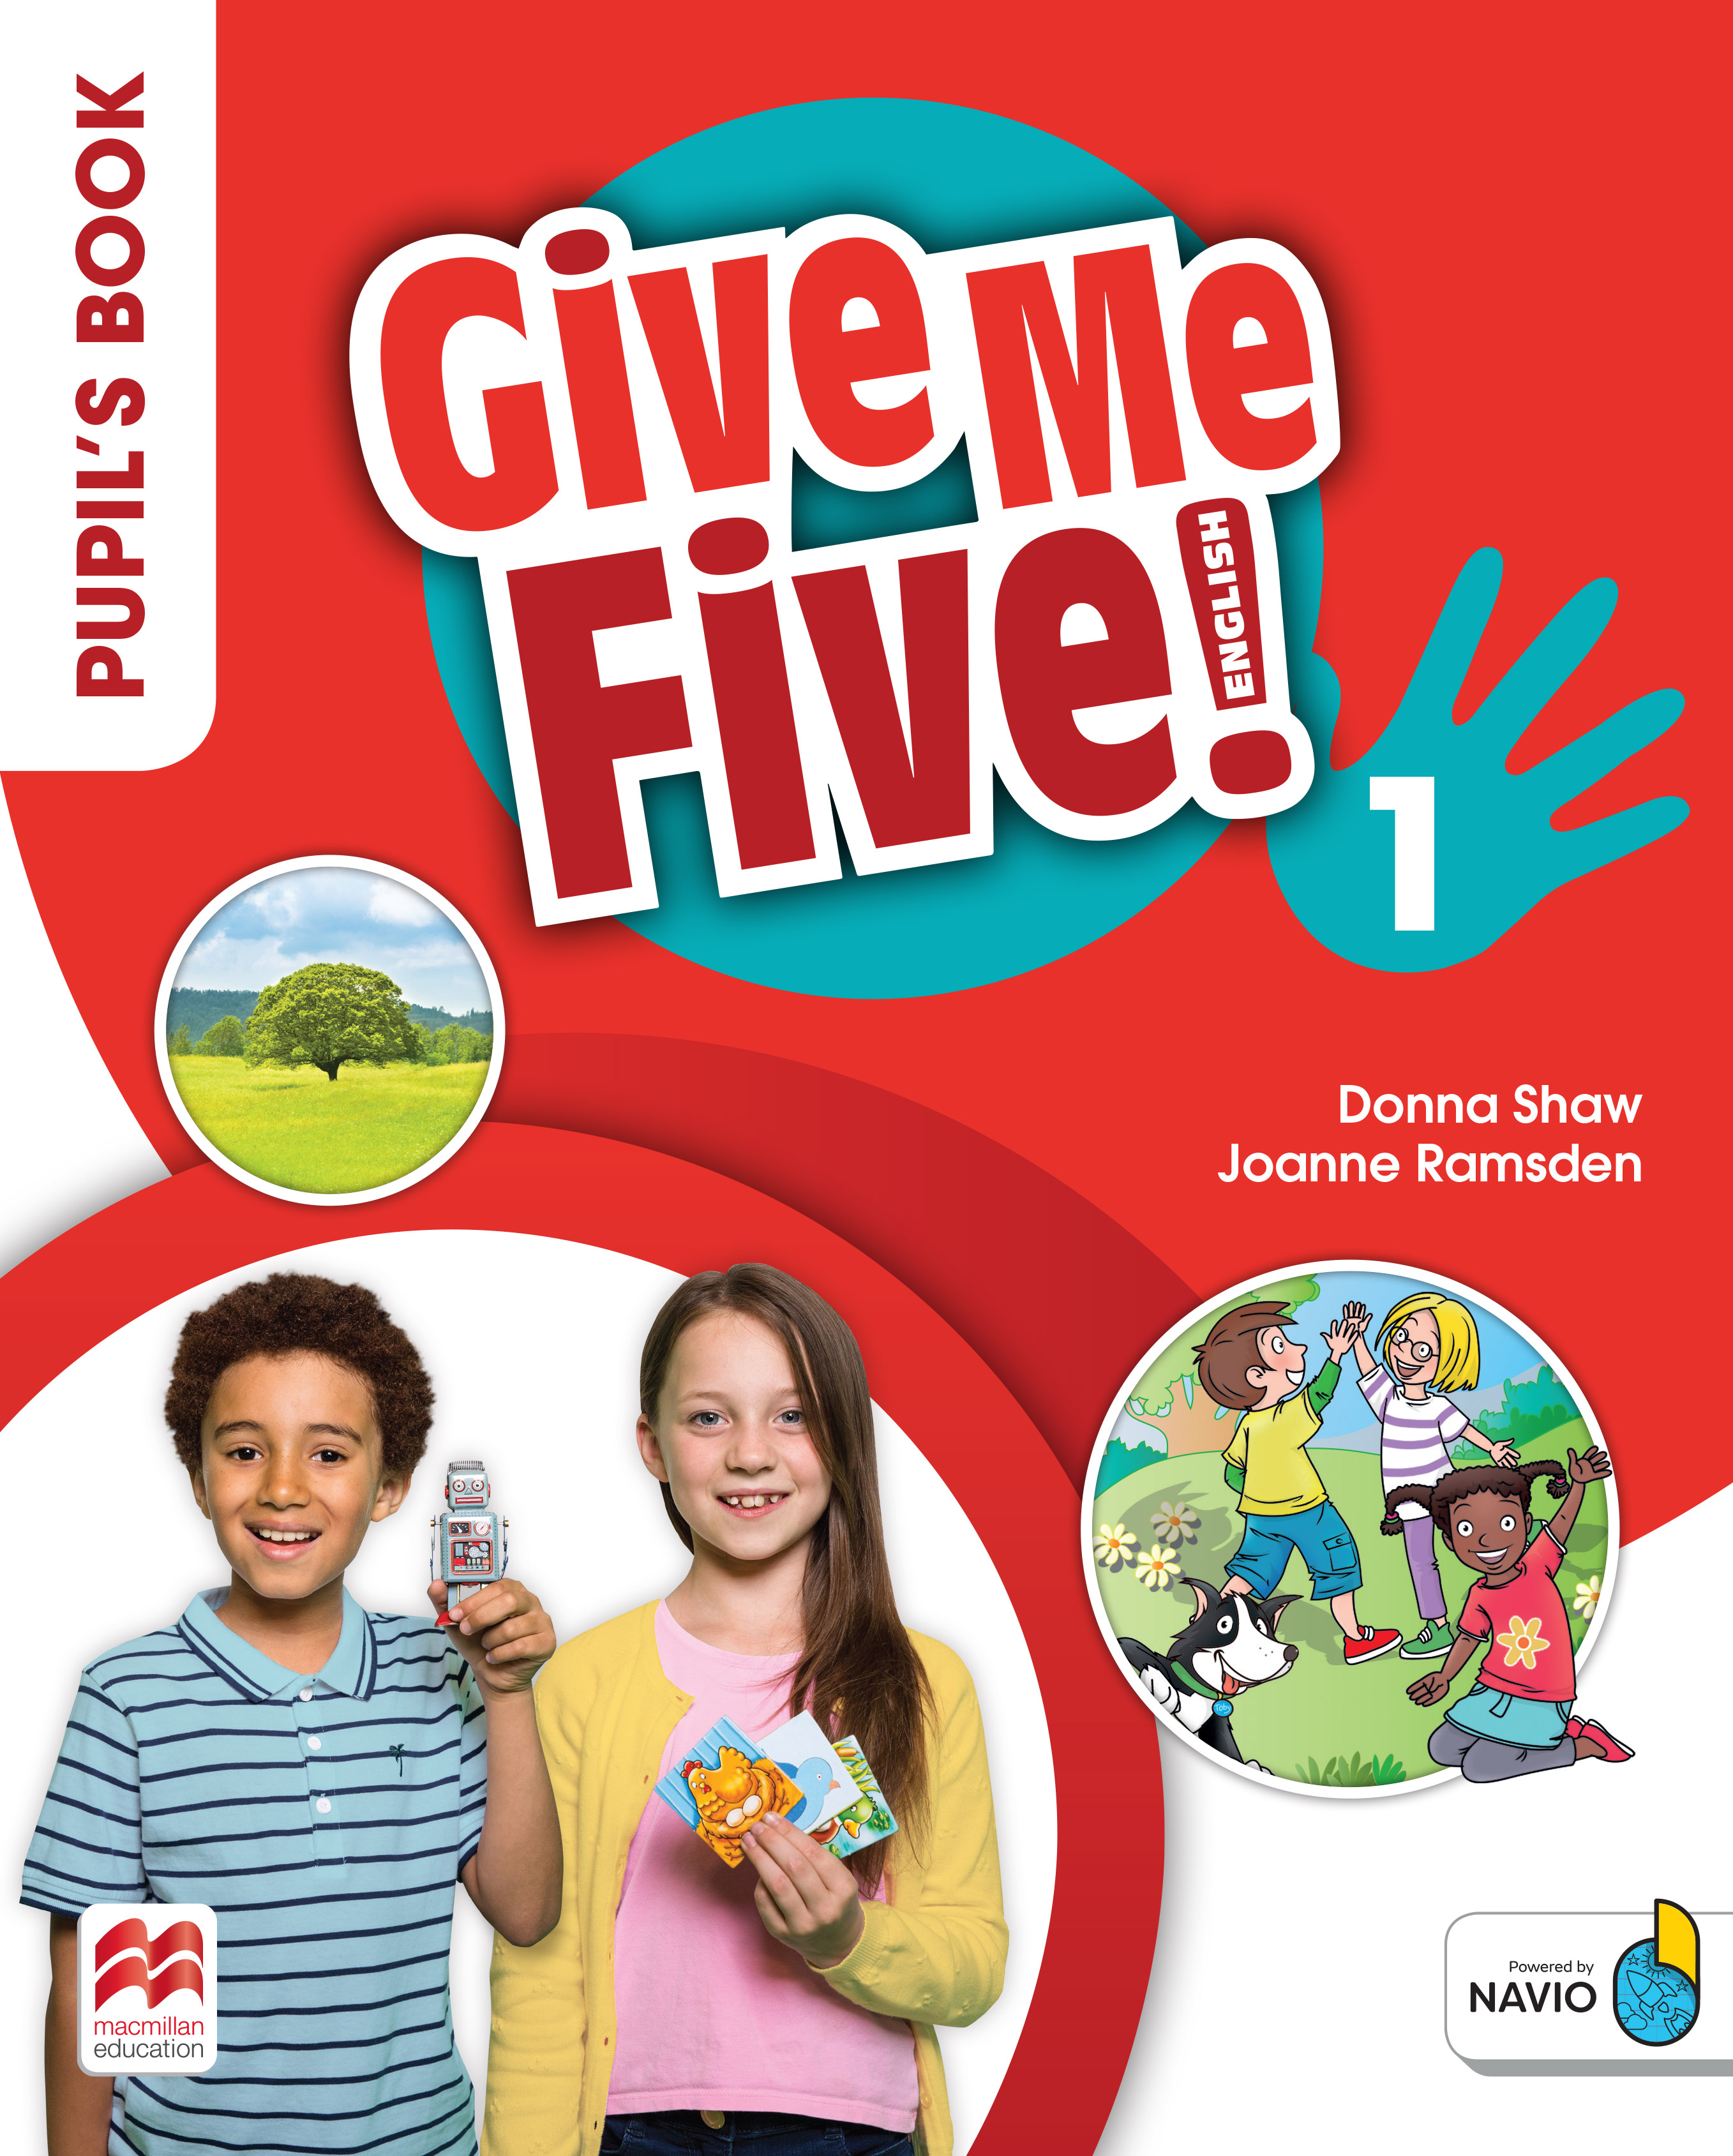 High five 1 scaricare